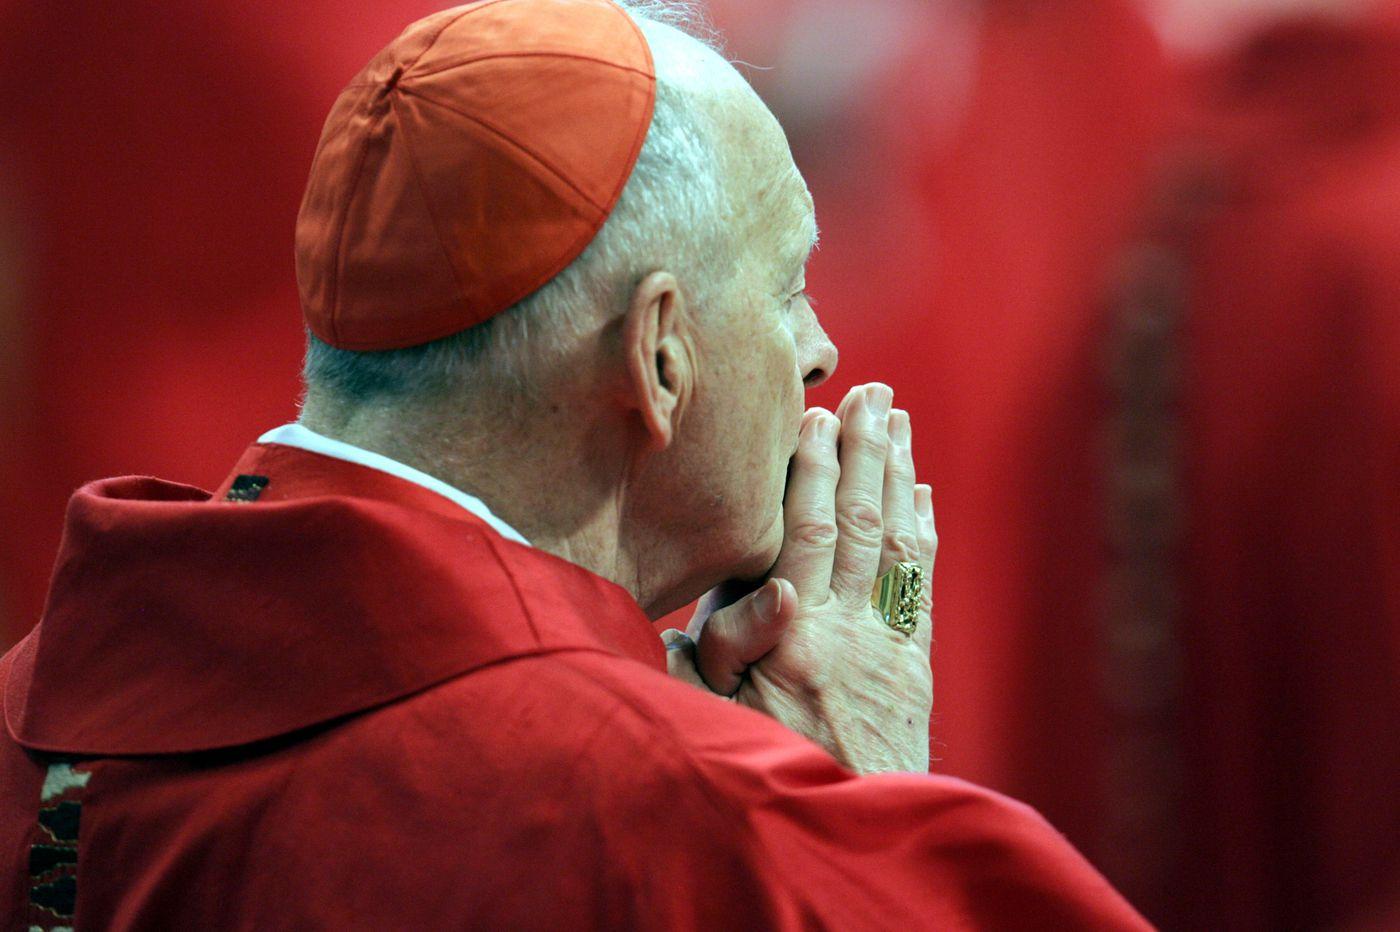 Vatican defrocks former US cardinal McCarrick for sex abuse